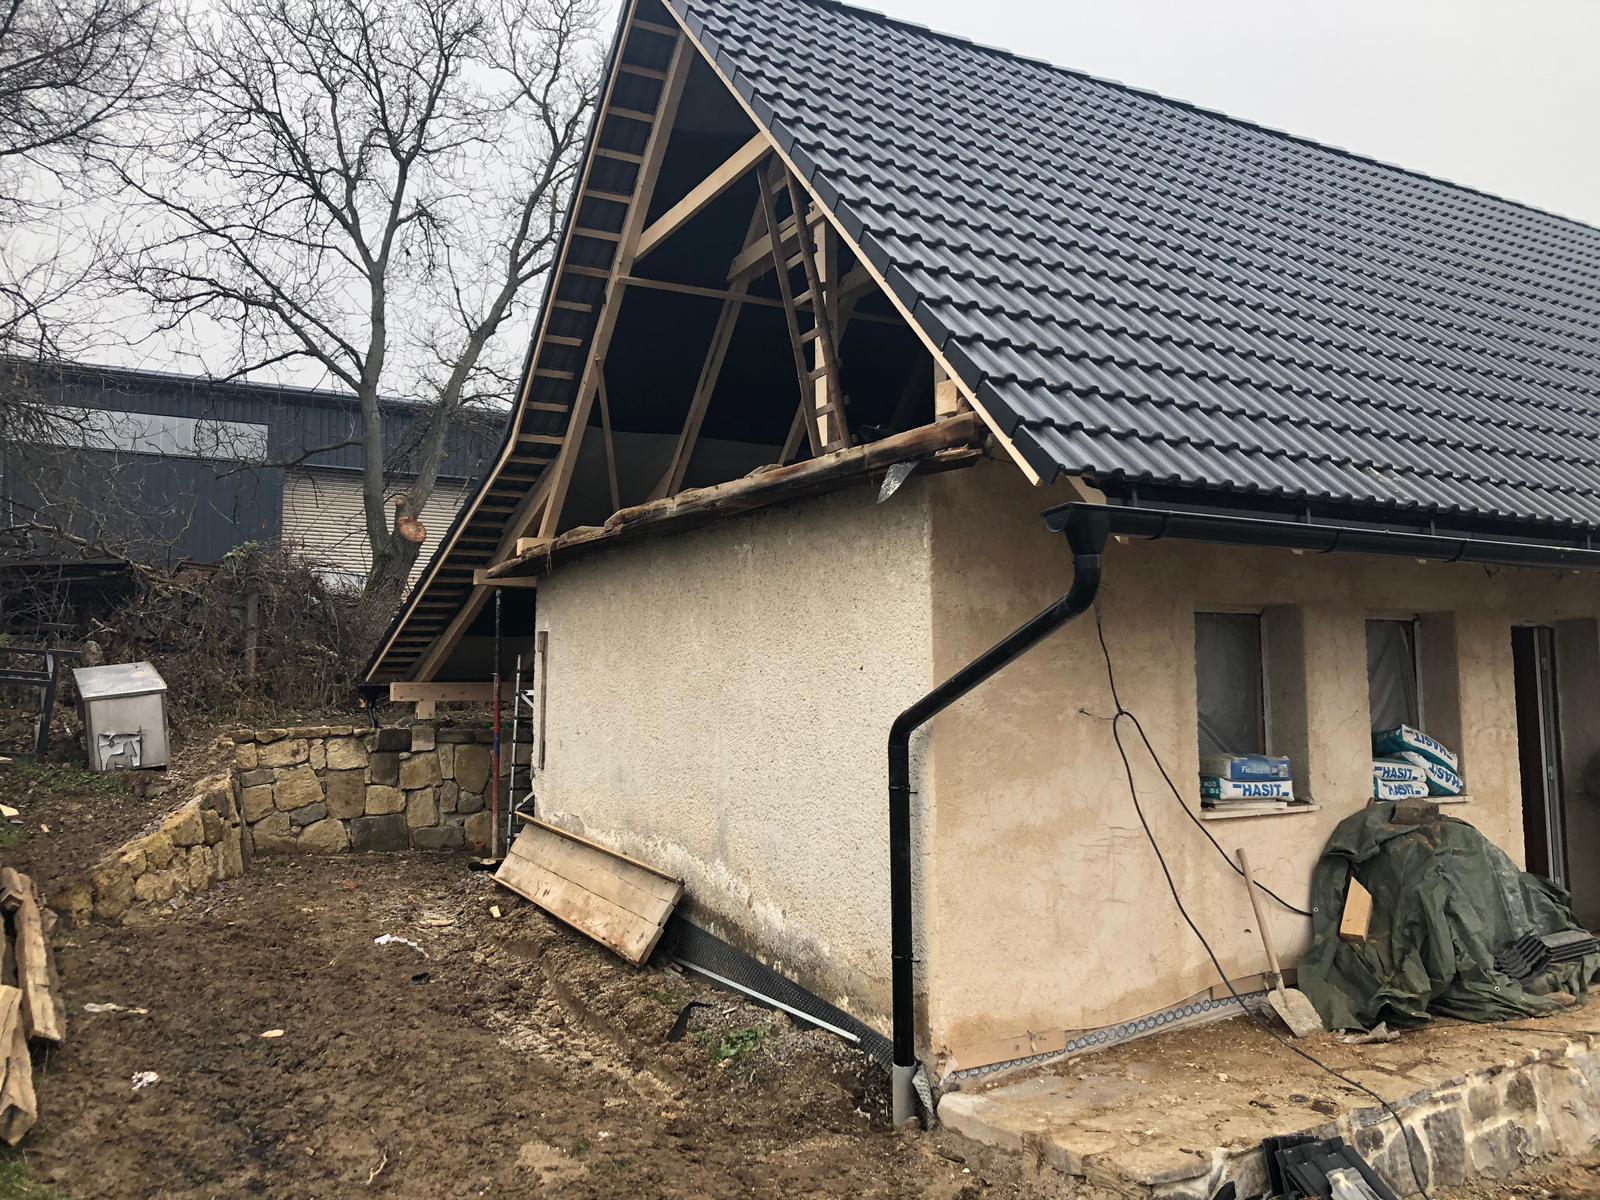 HACIENDA NAPOLI SEBECHLEBY - druha strana domu